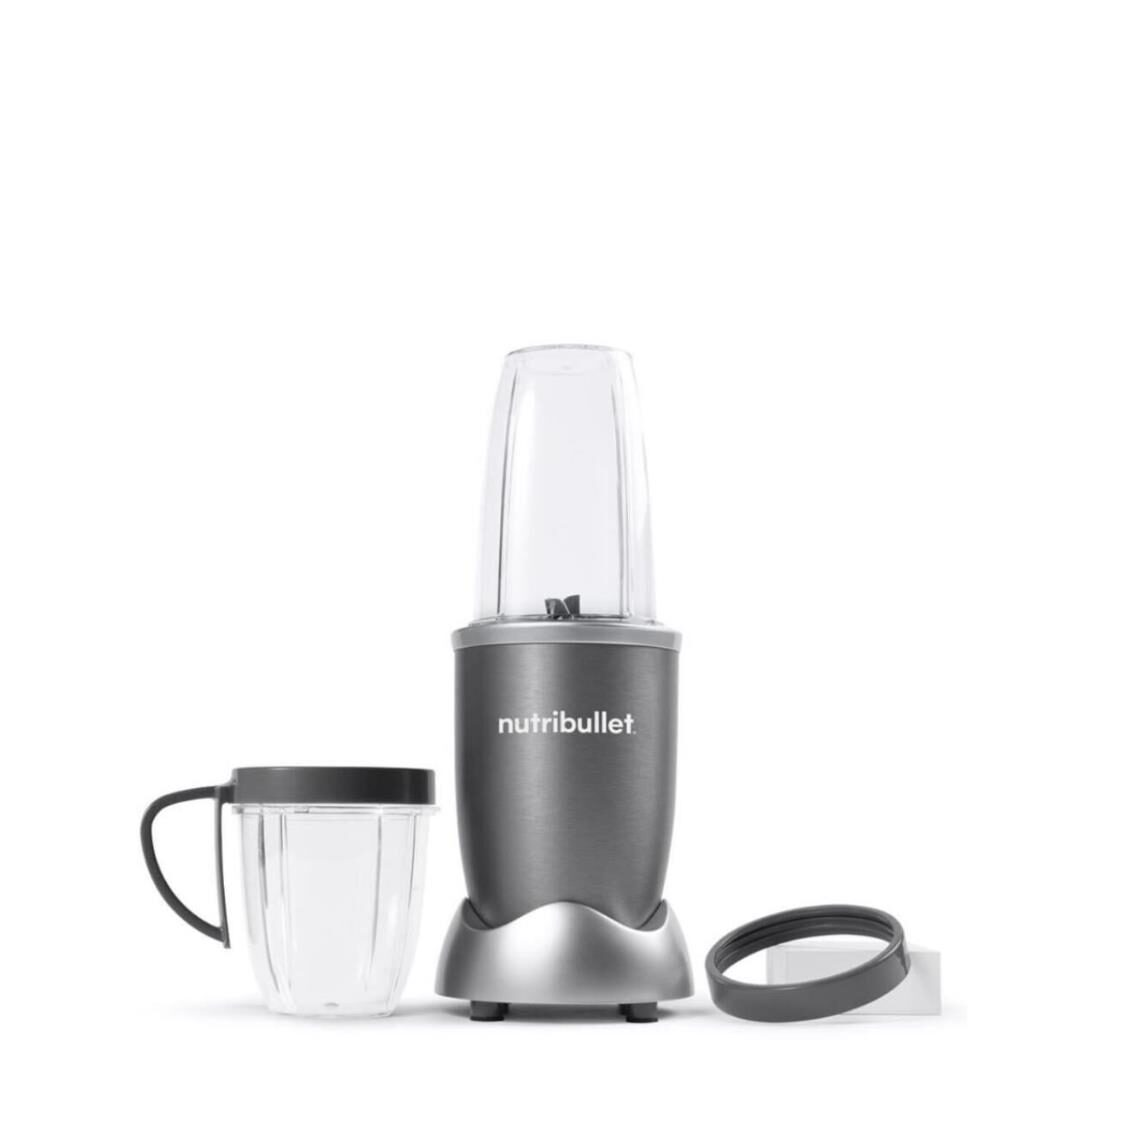 NutriBullet 600W Personal Blender Grey